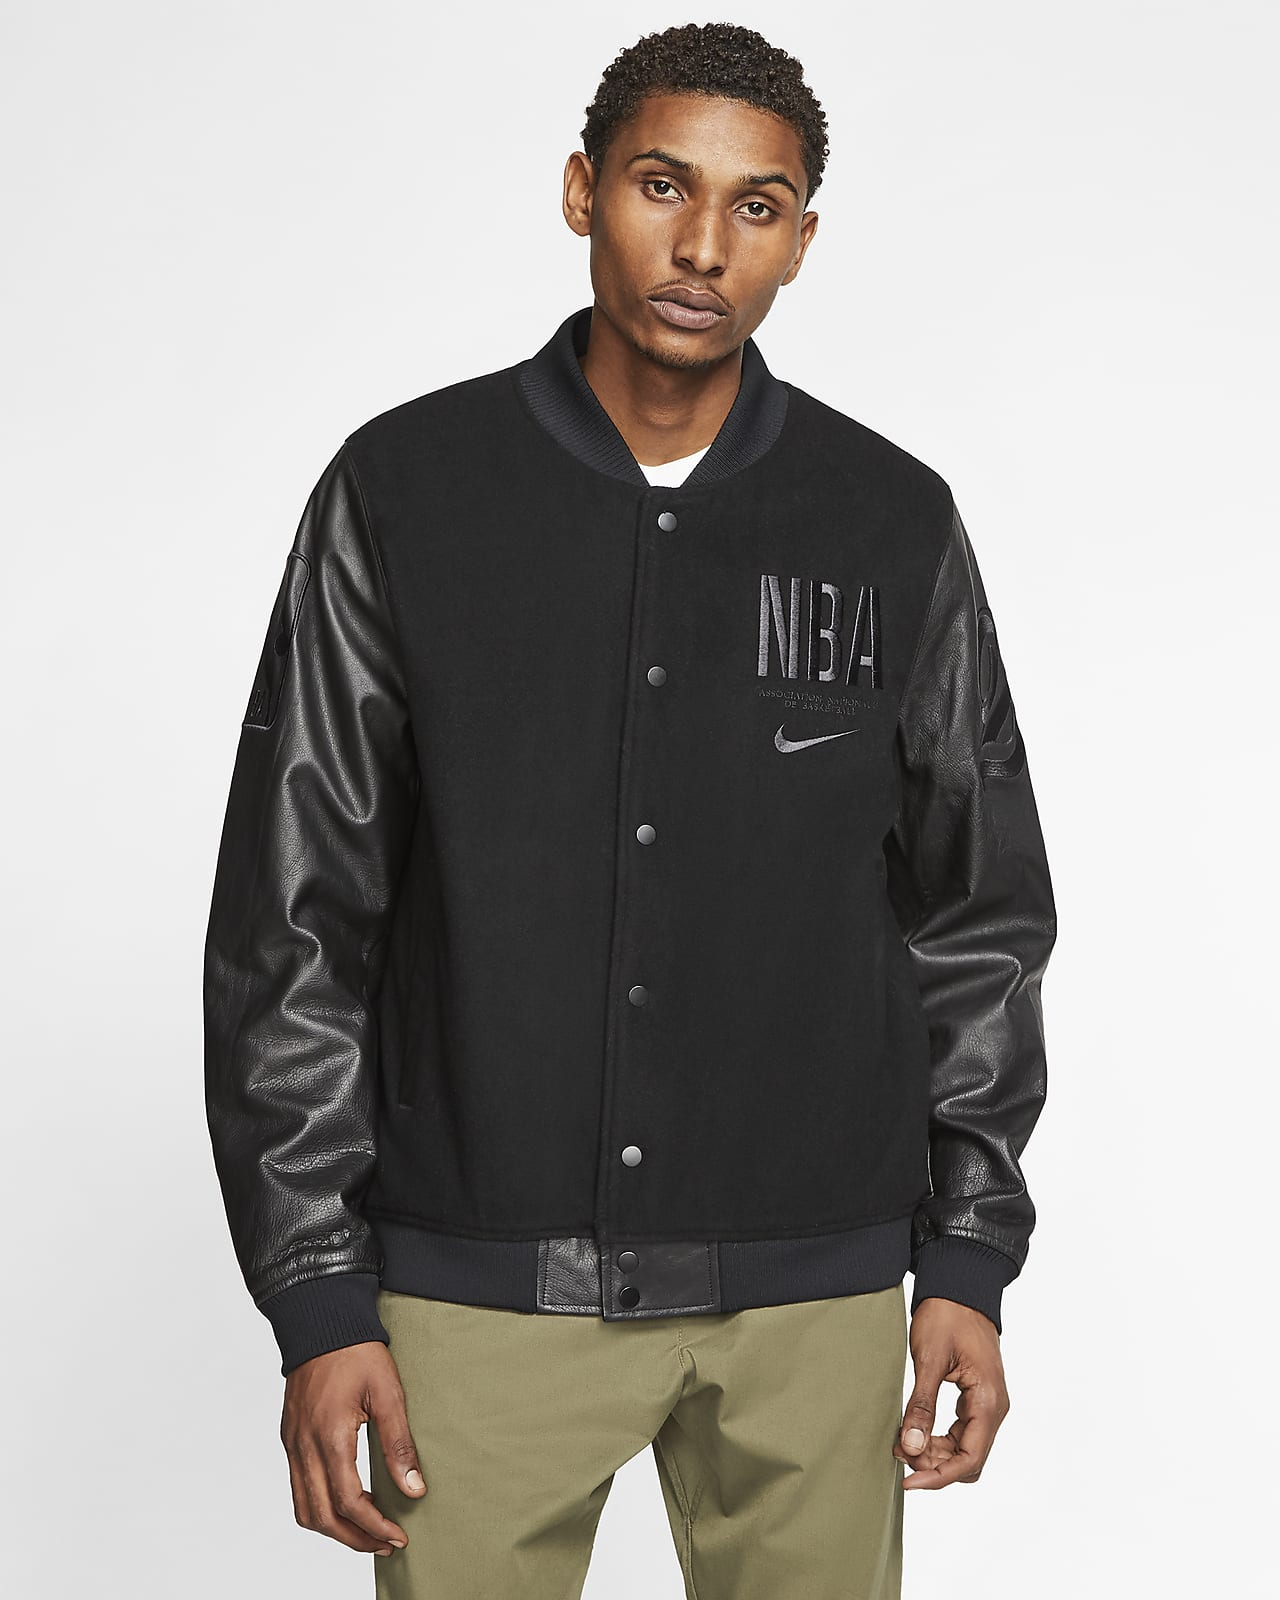 molécula gráfico Preguntar  Nike Courtside 'Paris' Men's NBA Destroyer Jacket. Nike CA